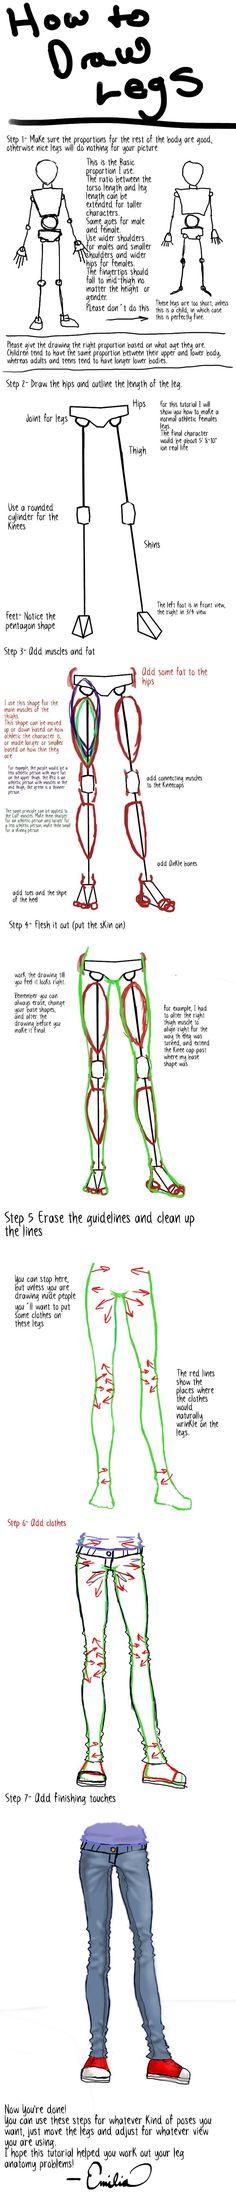 How to Draw Legs Tutorial by EmiliaArgon.deviantart.com on @deviantART